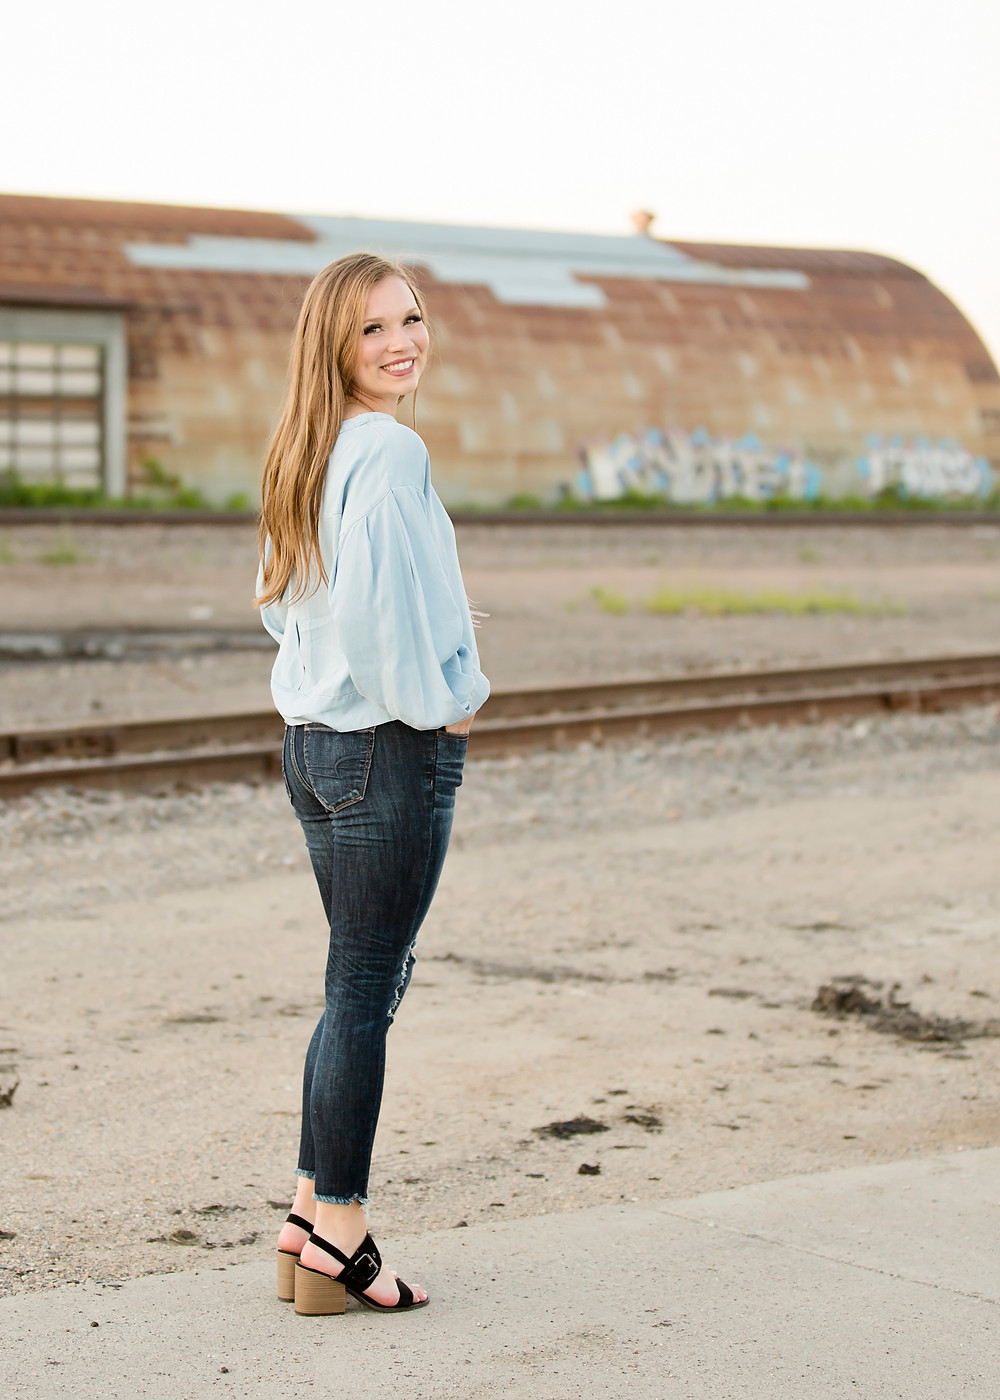 Outdoor Senior Photographer